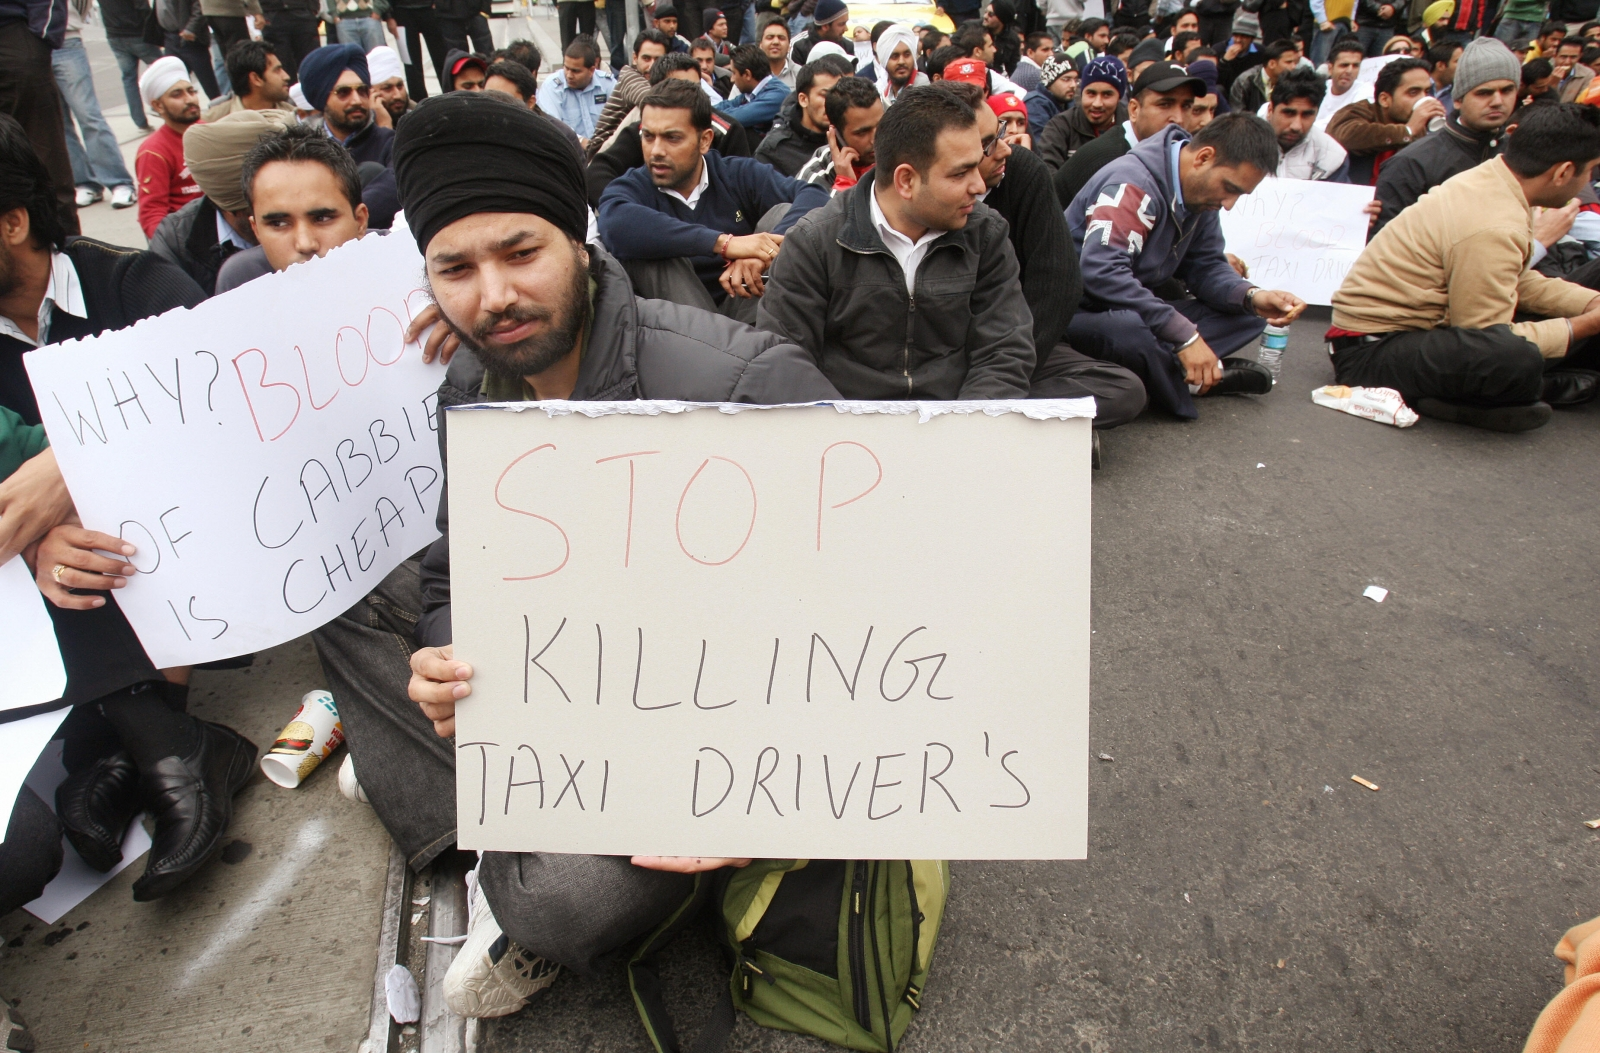 Australia taxi driver attacked